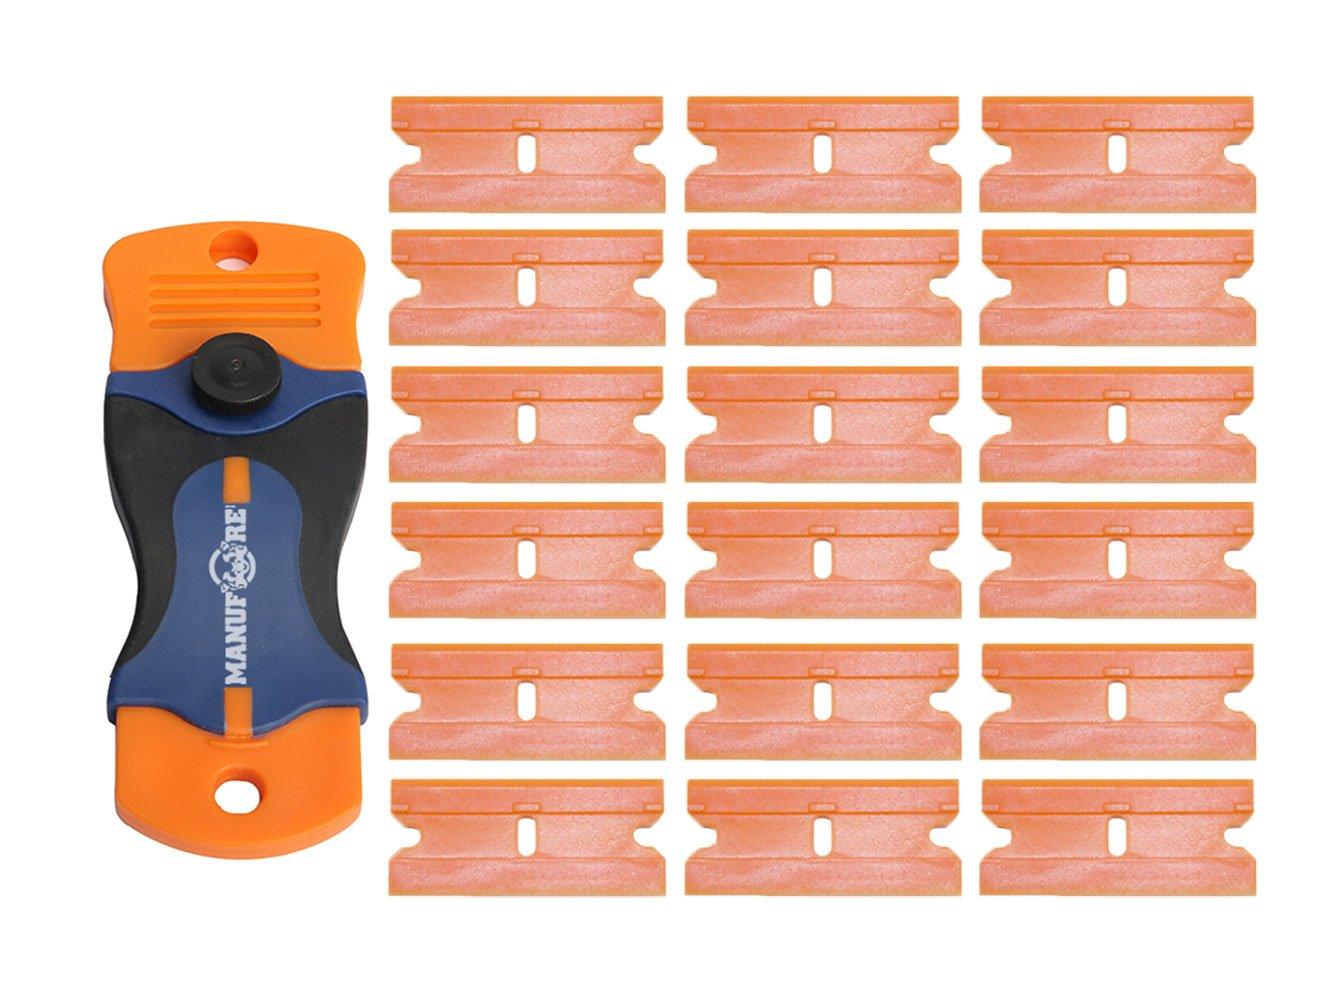 MANUFORE Portable Little Plastic Razor Scraper for Cleaning Glass Stove-top, Window,Floor